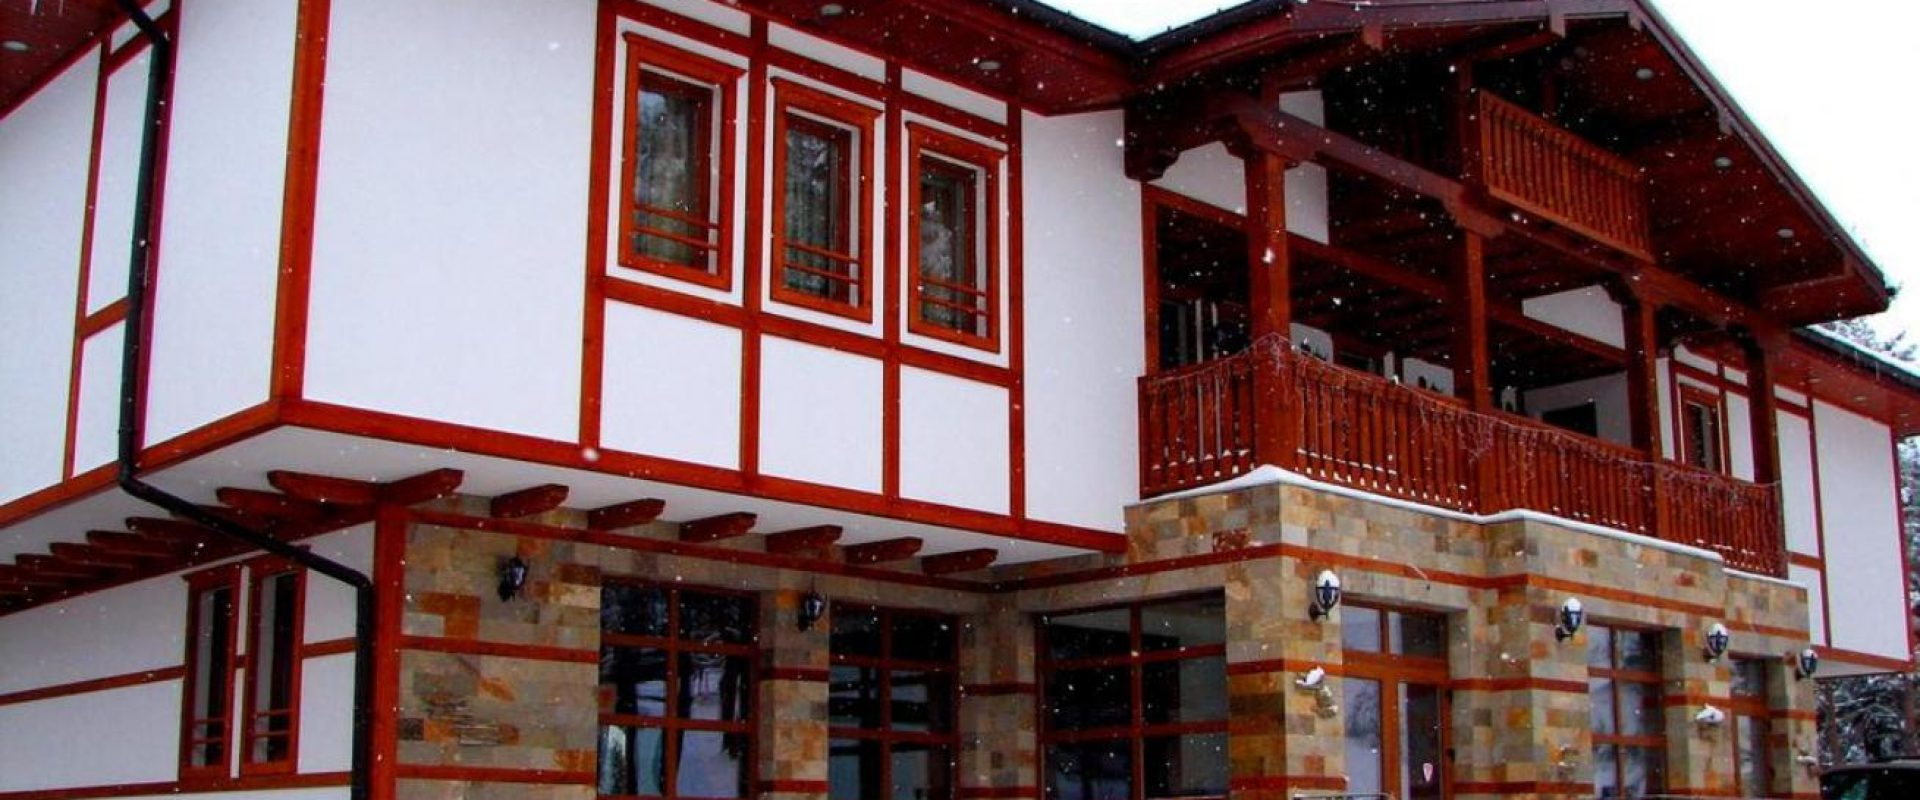 Vacanță la munte în Bulgaria, Pamporova, Hotel Merryan